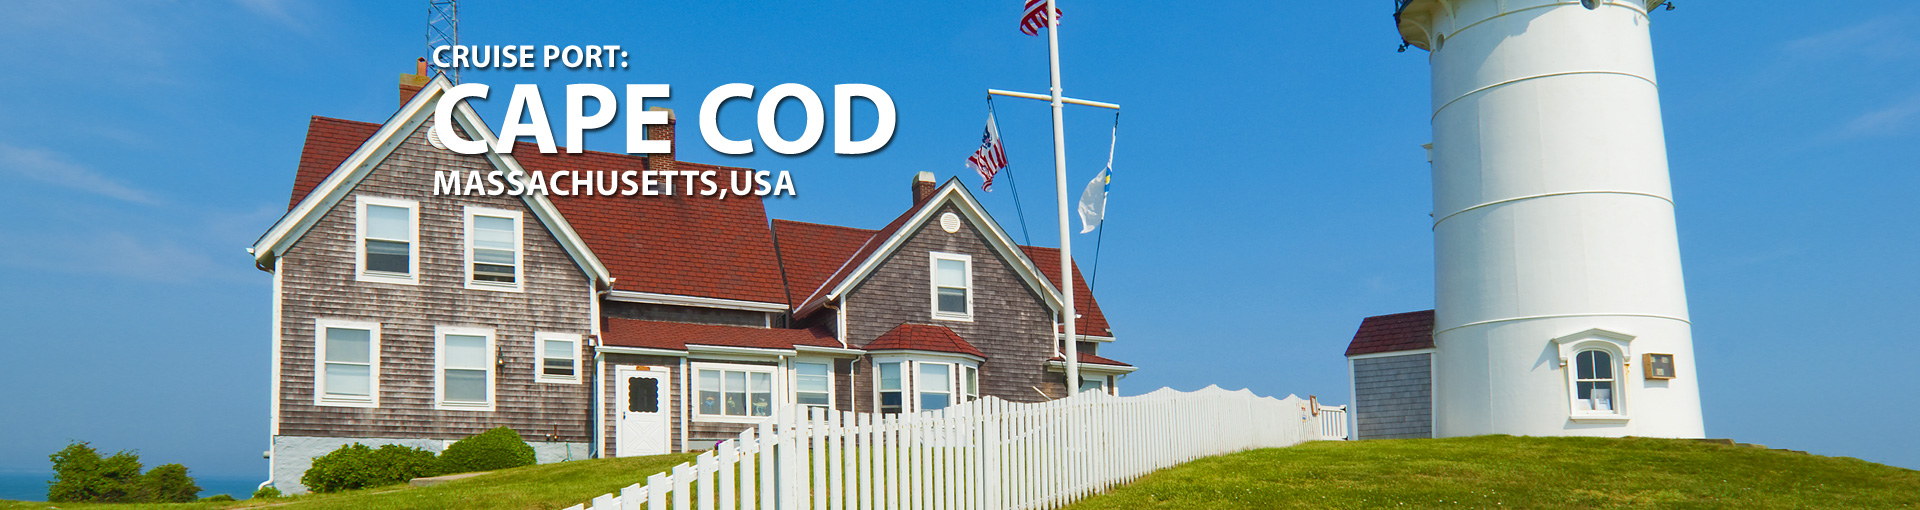 Cruises to Cape Cod, Massachusetts